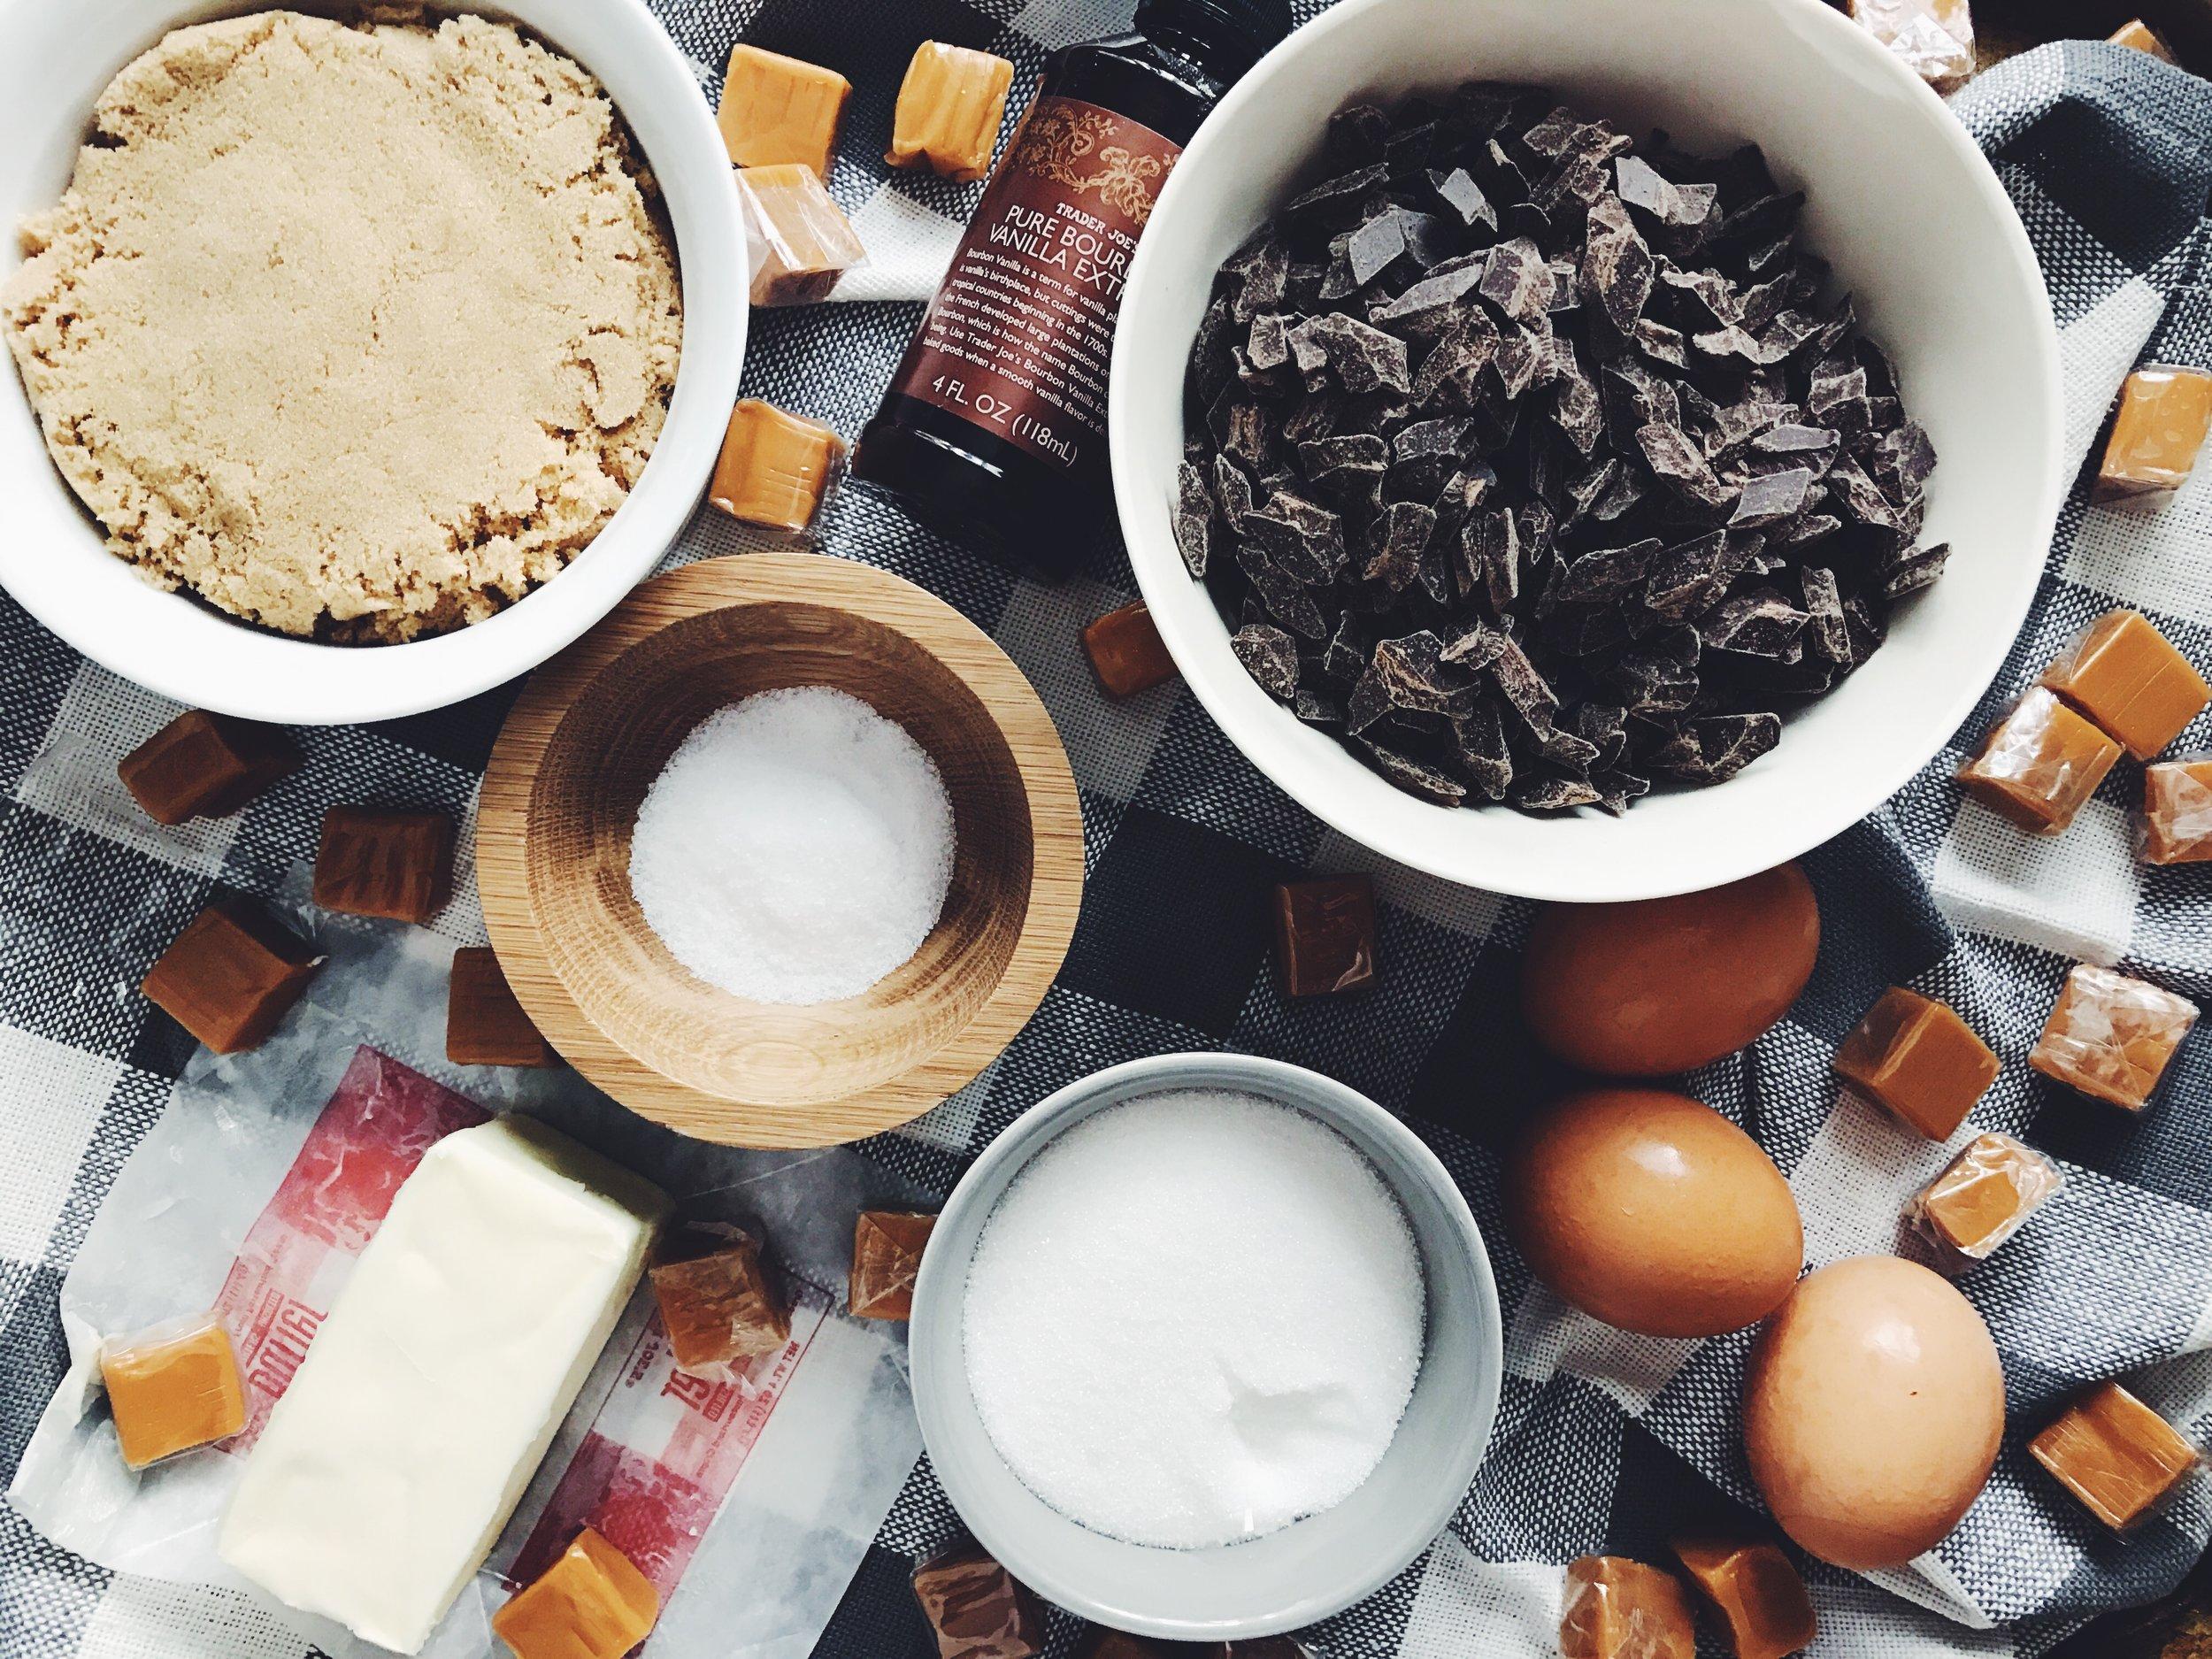 salted caramel chocolate chunk cookie ingredients